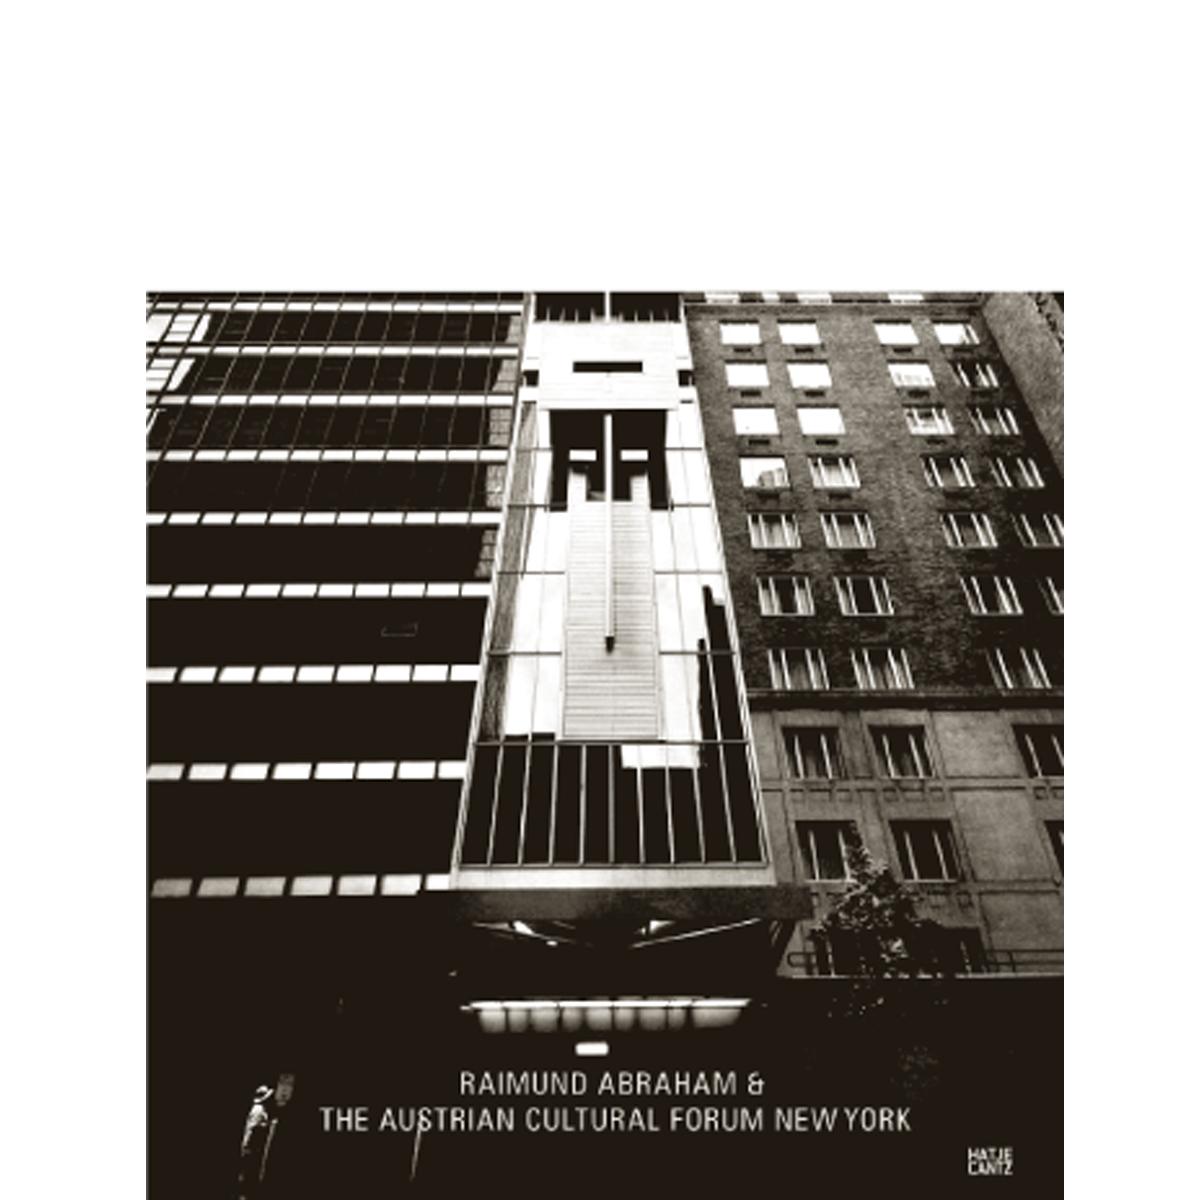 Raimund Abraham &The Austrian Cultural Forum New York